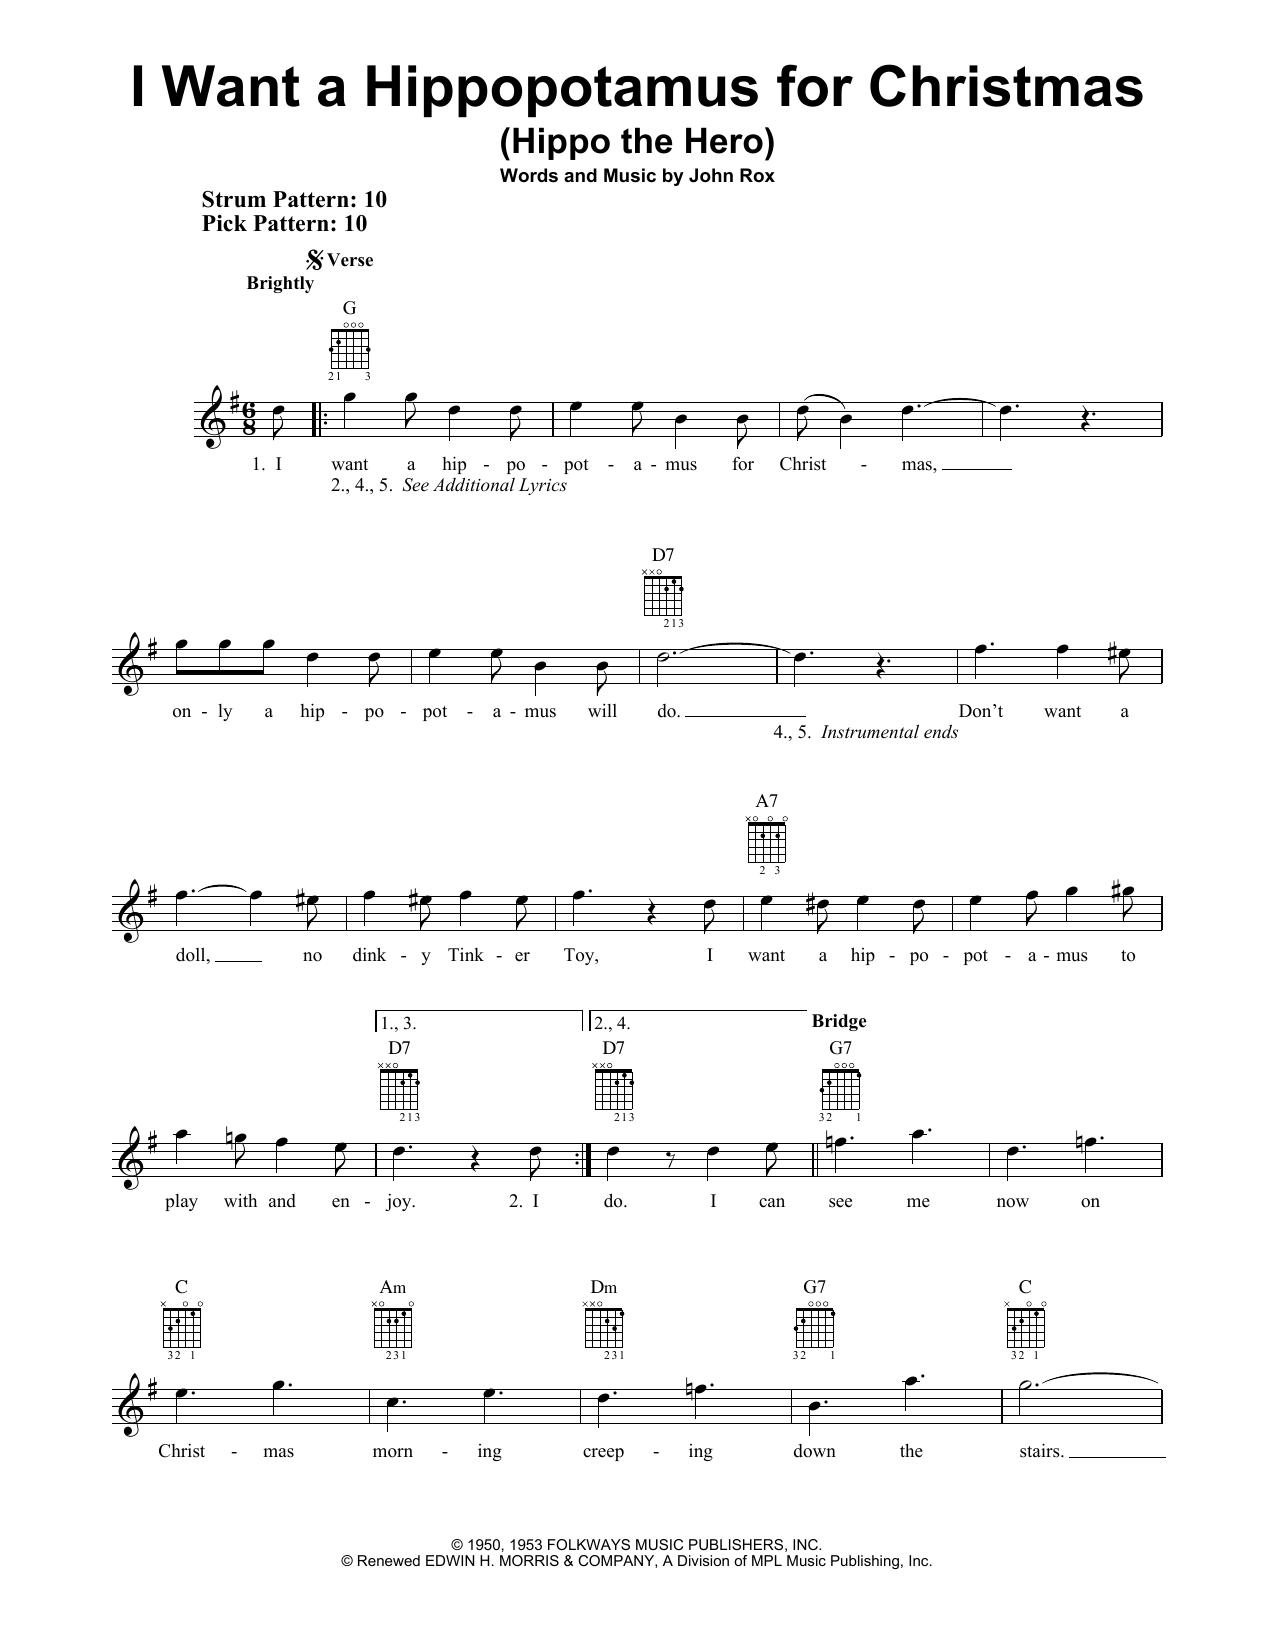 I Want A Hippopotamus For Christmas Sheet Music.Sheet Music Digital Files To Print Licensed John Rox